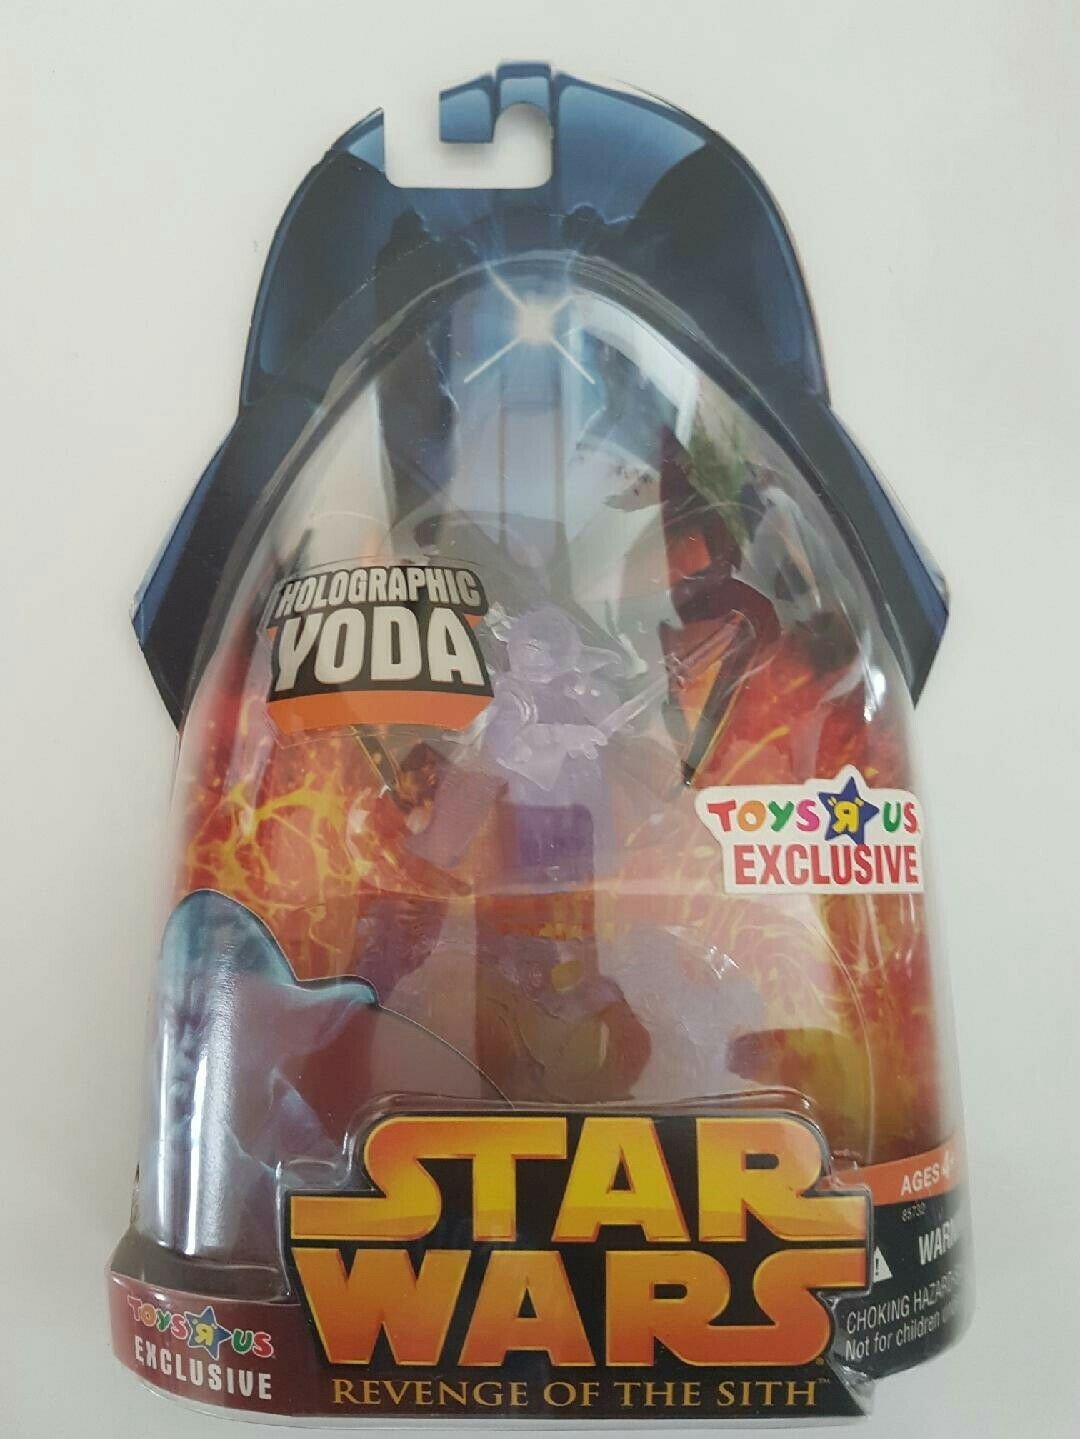 StarWars figurine : STAR WARS FIGURINE HOLOGRAPHIC YODA EXCLUSIVE SÉRIE REVENGE OF THE SITH NEUF